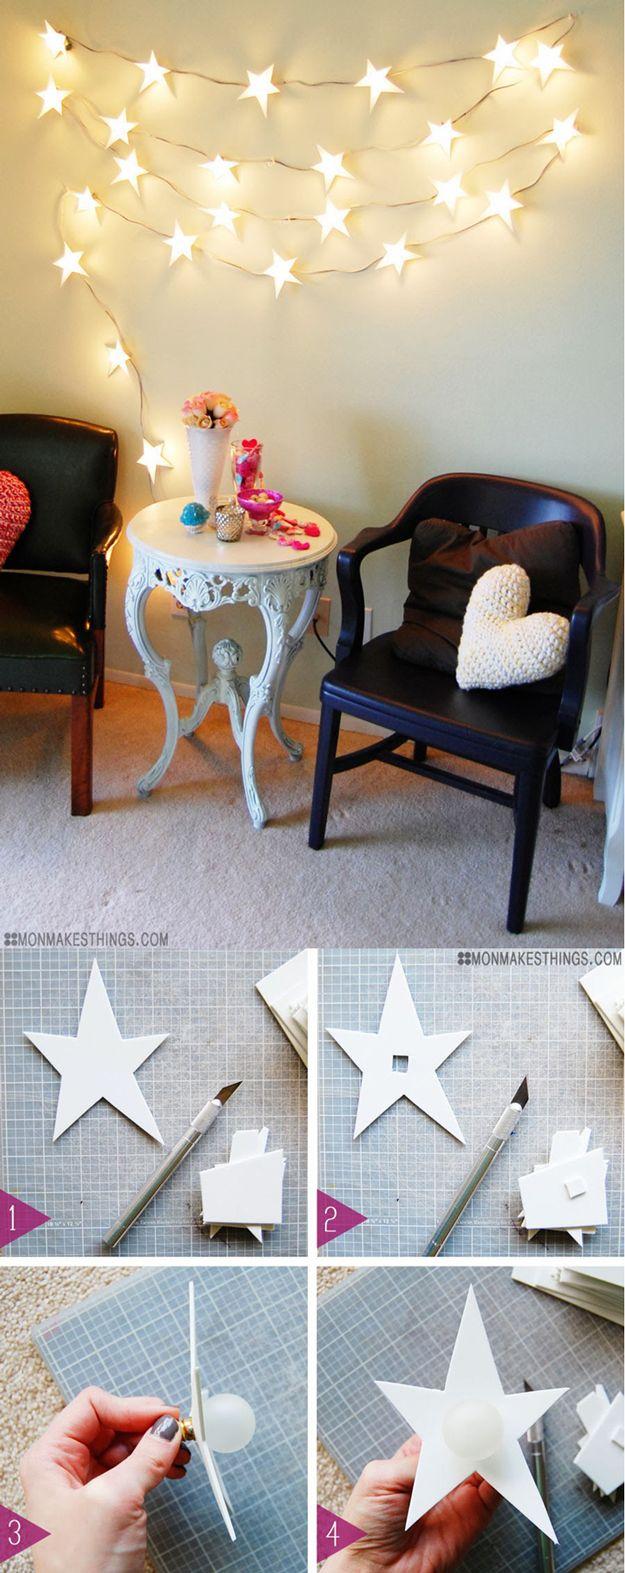 33 Awesome Diy String Light Ideas Diy Pinterest Diy Room